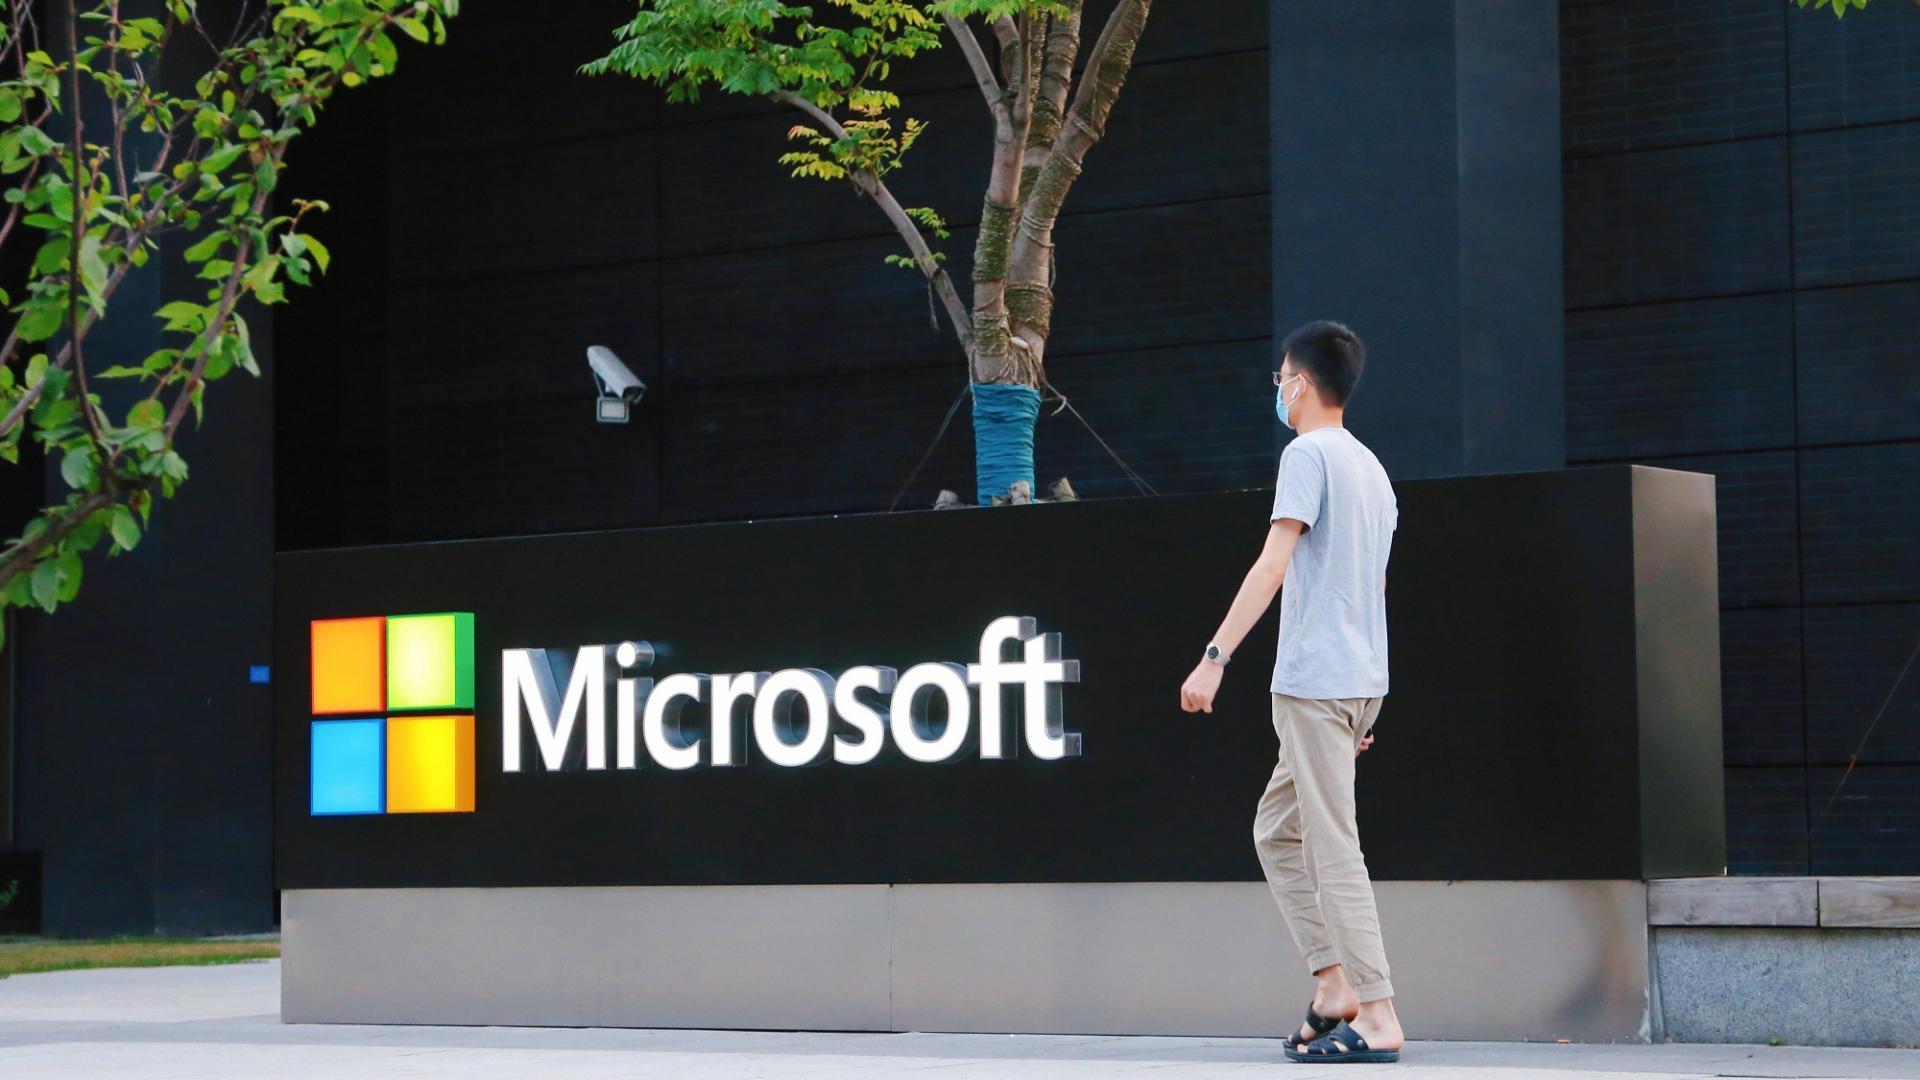 Mann, Unternehmen, Microsoft